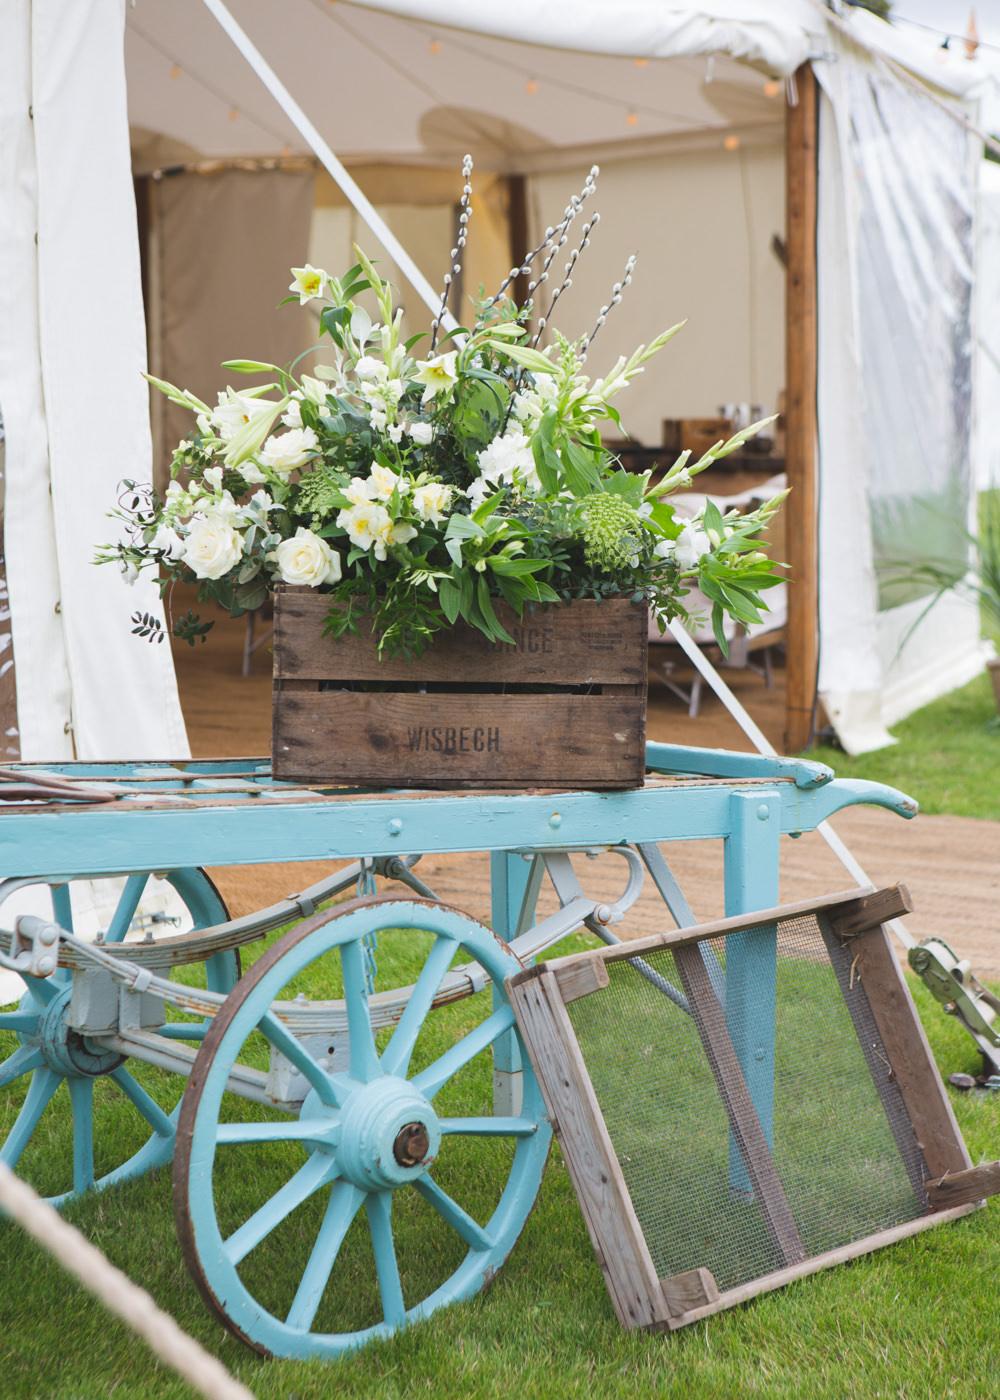 Wagon Trailer Decor Crate Flowers Wooden Airbnb Wedding Pickavance Weddings